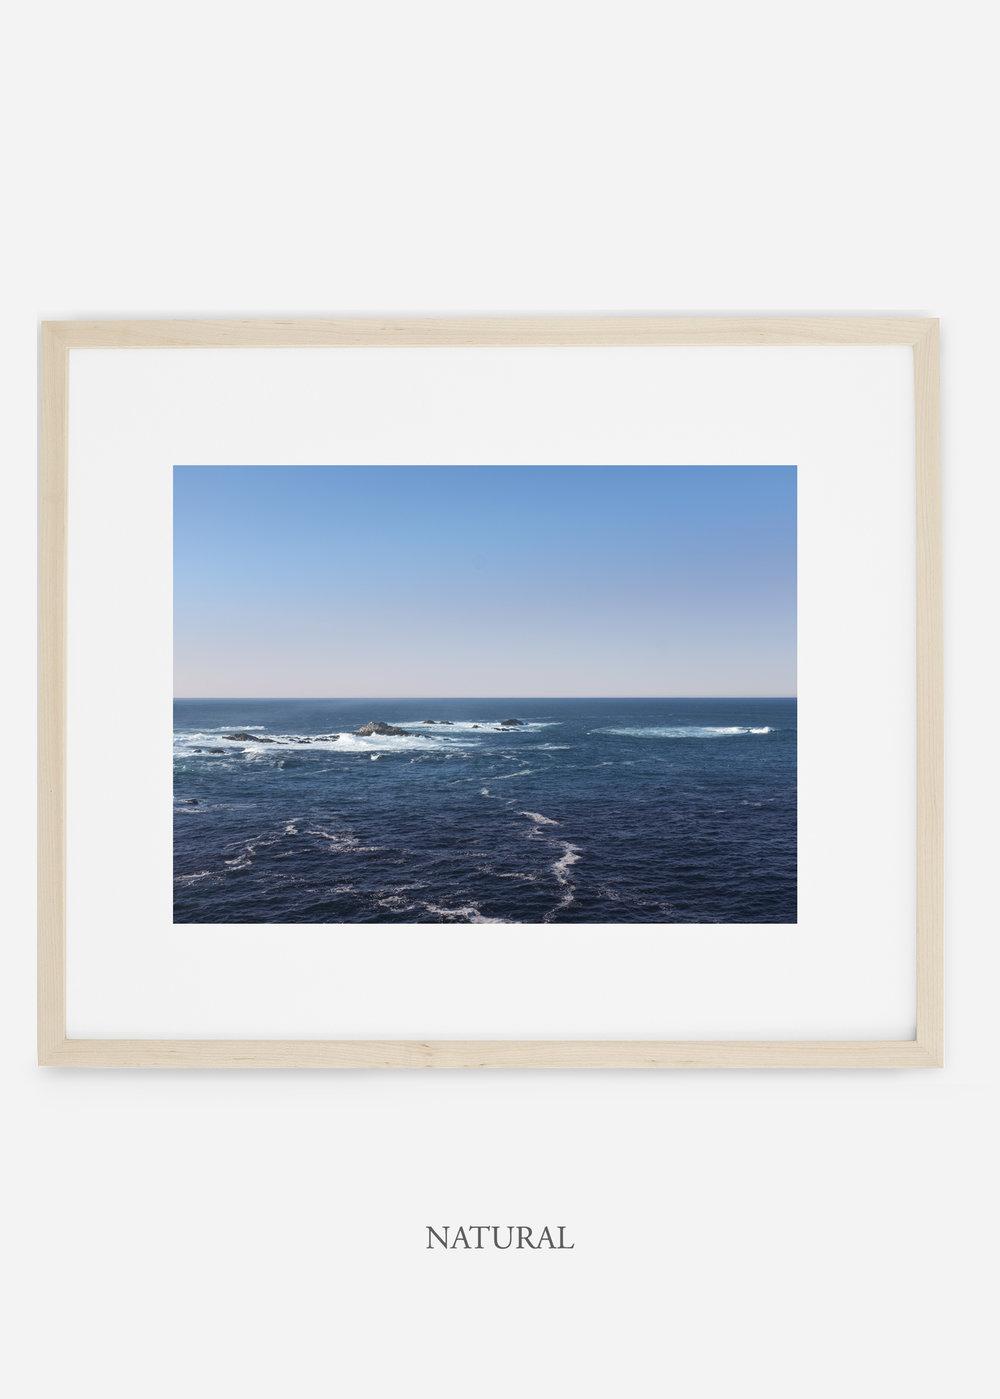 WilderCalifornia_naturalframe_interiordesign_oceanprint_PacificOceanNo.1.jpg